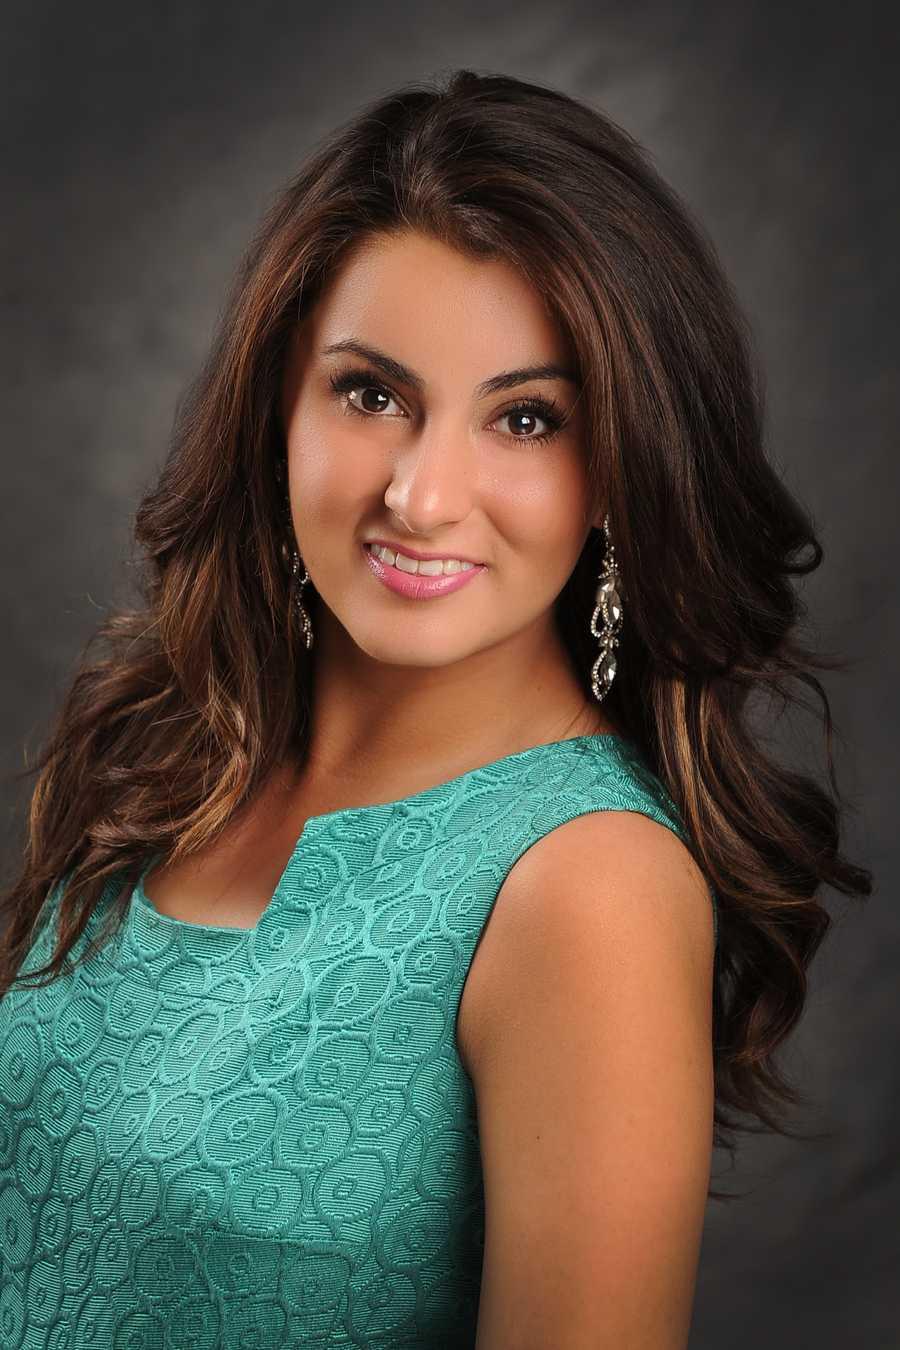 Alexa Vigil, Miss Eastern NM